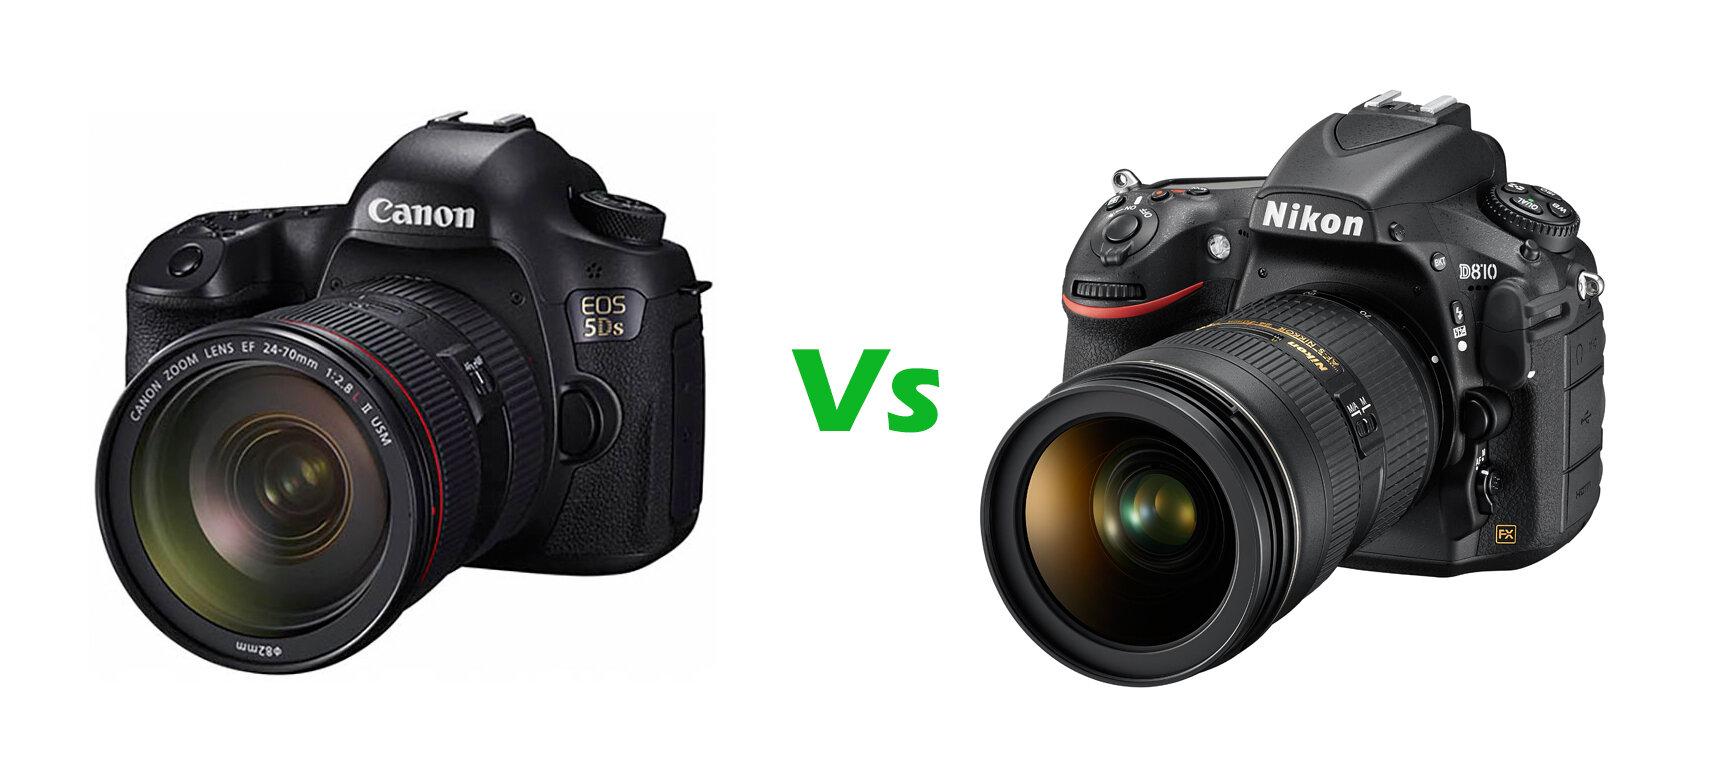 So sánh máy ảnh Sony A58 và Canon EOS 5Ds